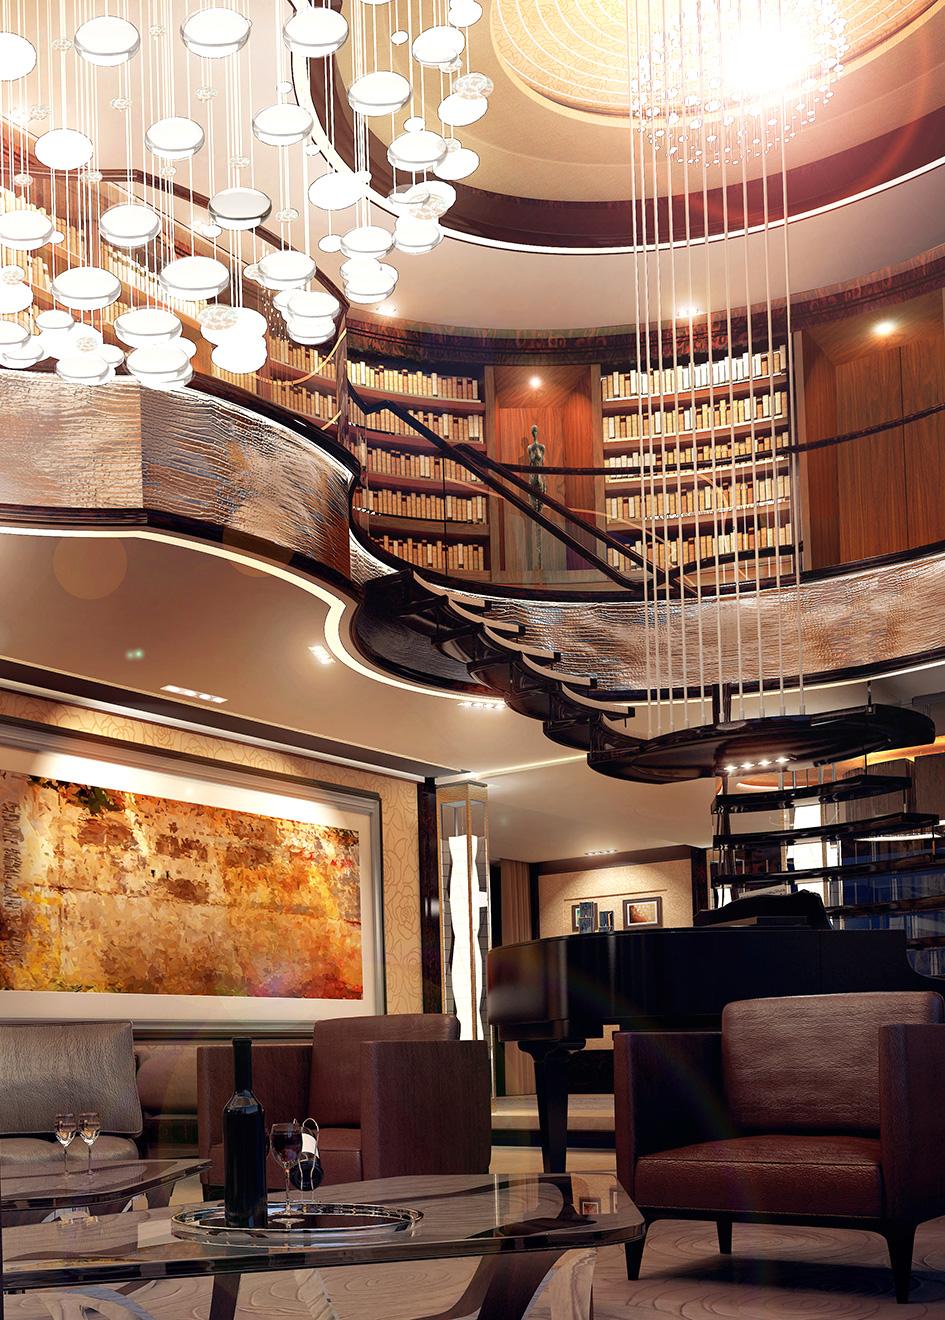 Portrait Nobiskrug Radiance Concept Yacht Atrium